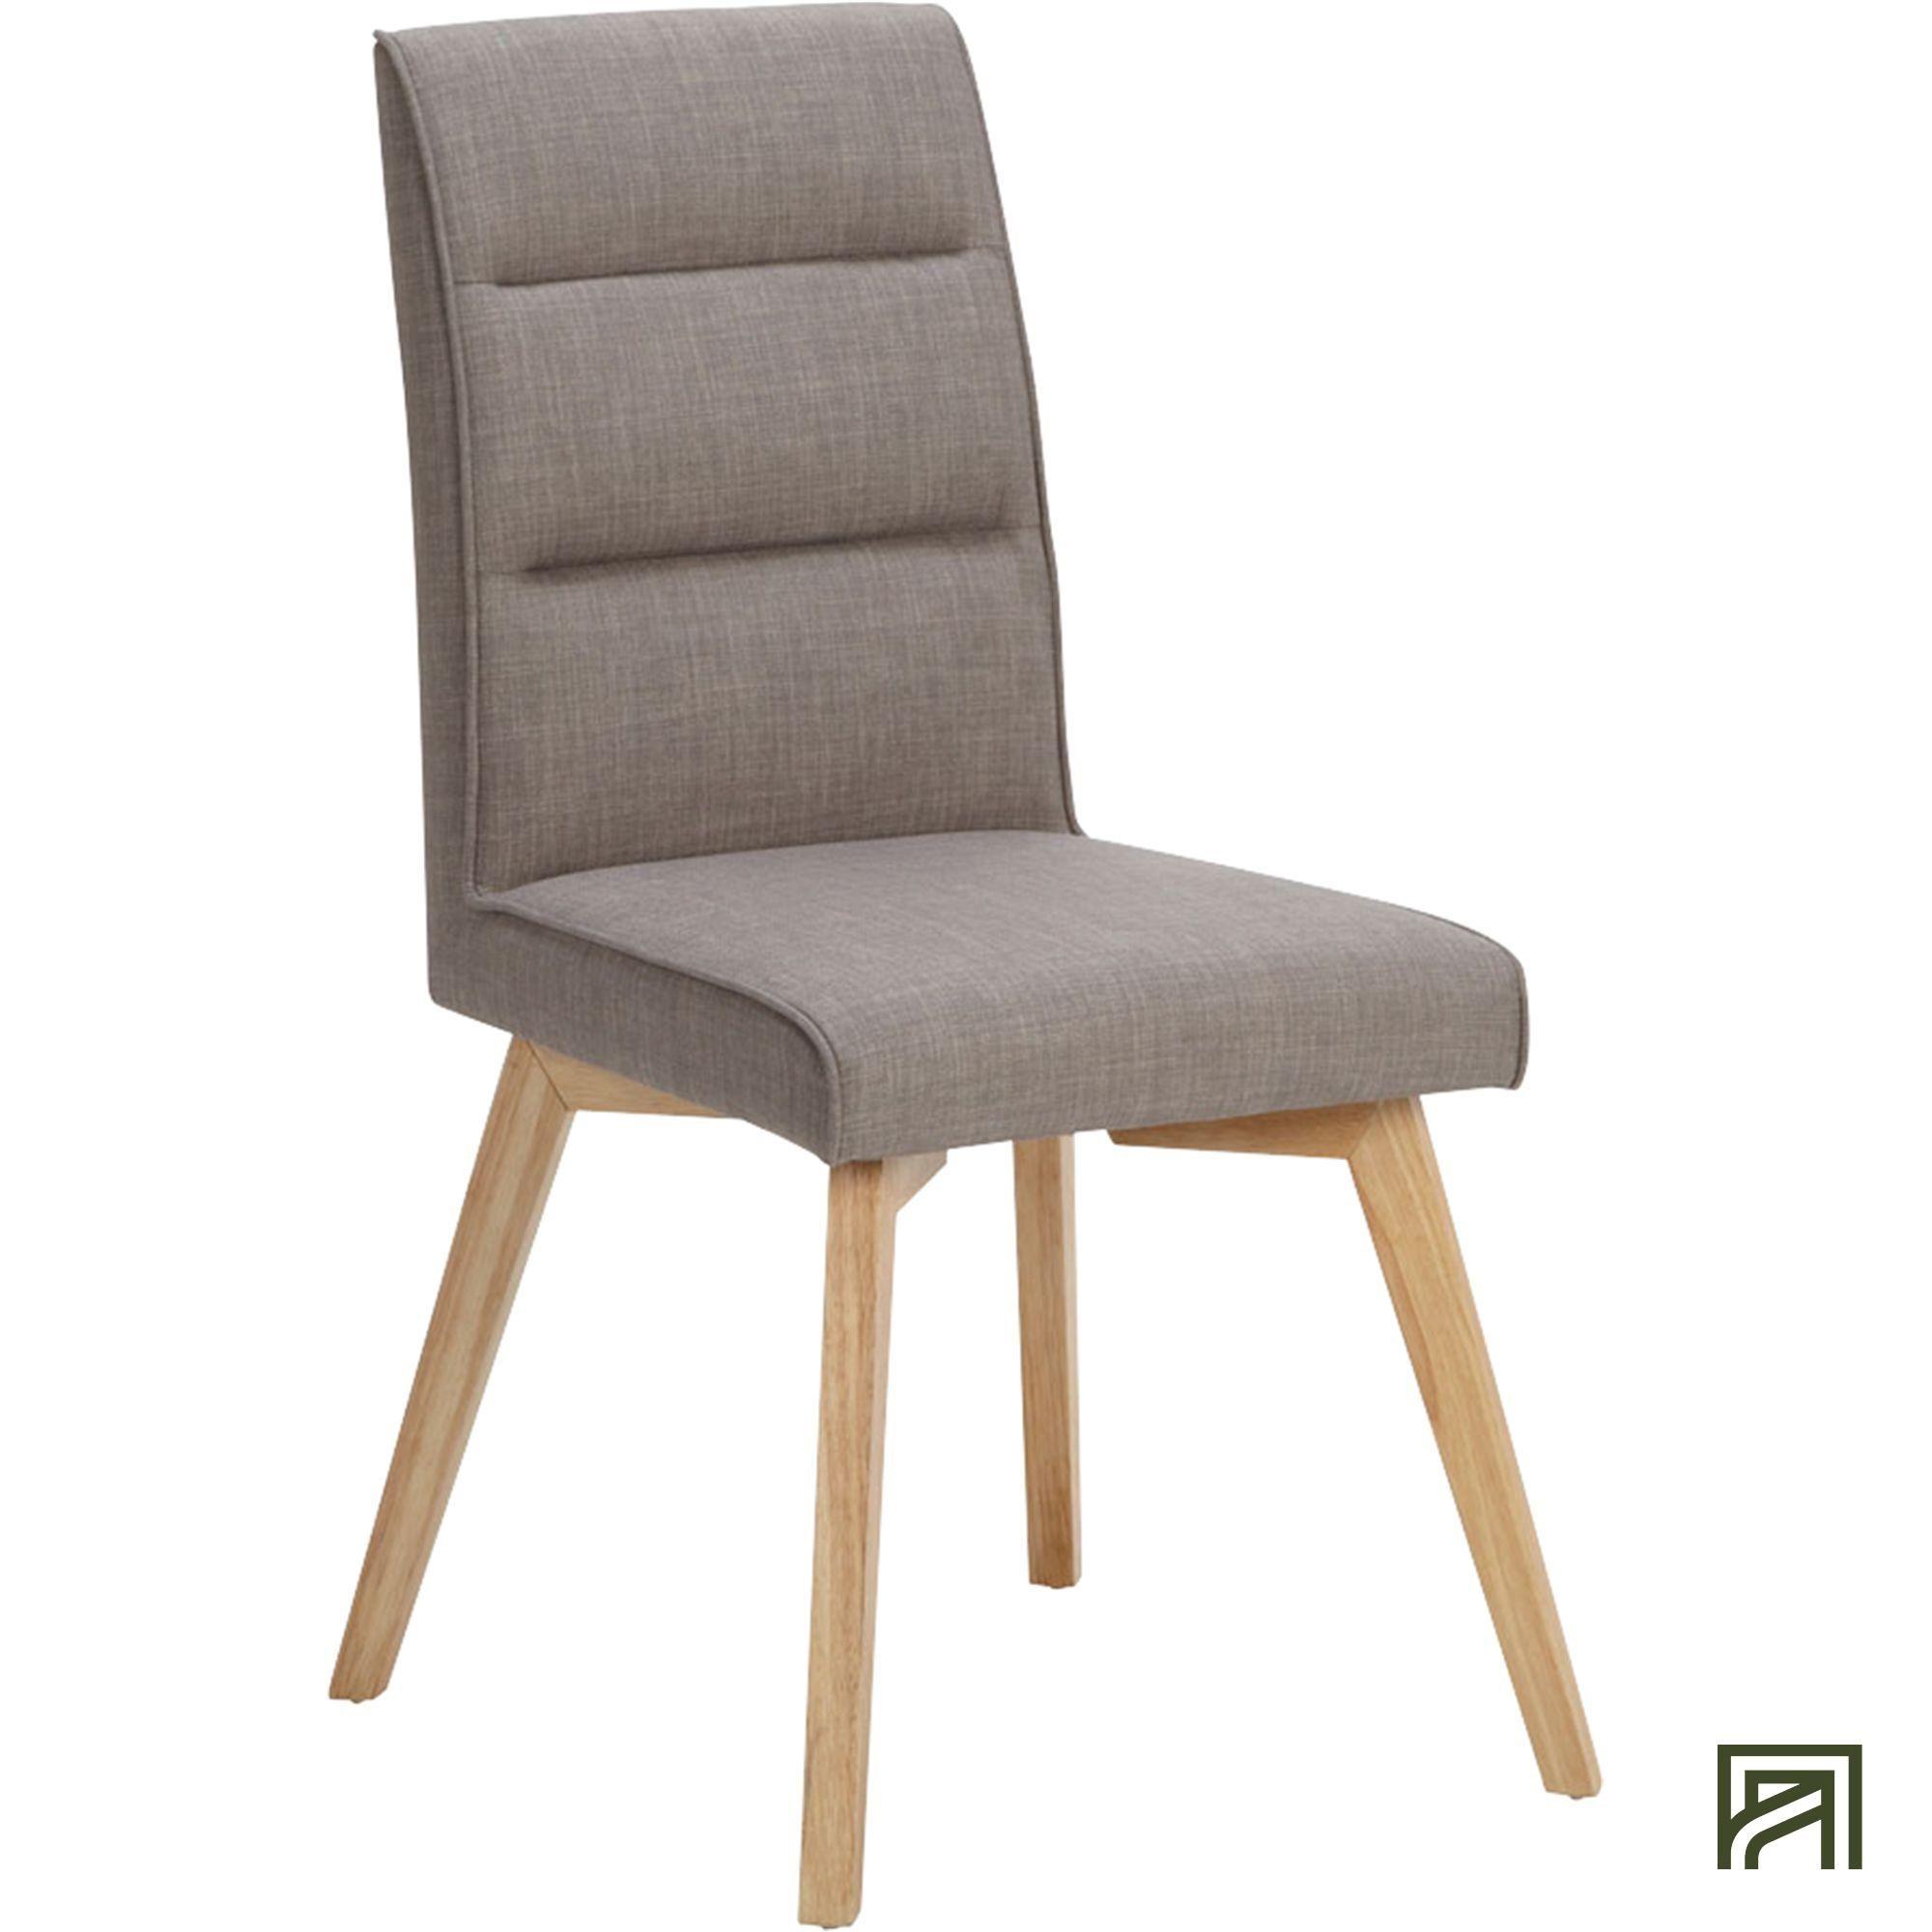 alinea : nestor chaise dossier haut en tissu taupe #Alinea